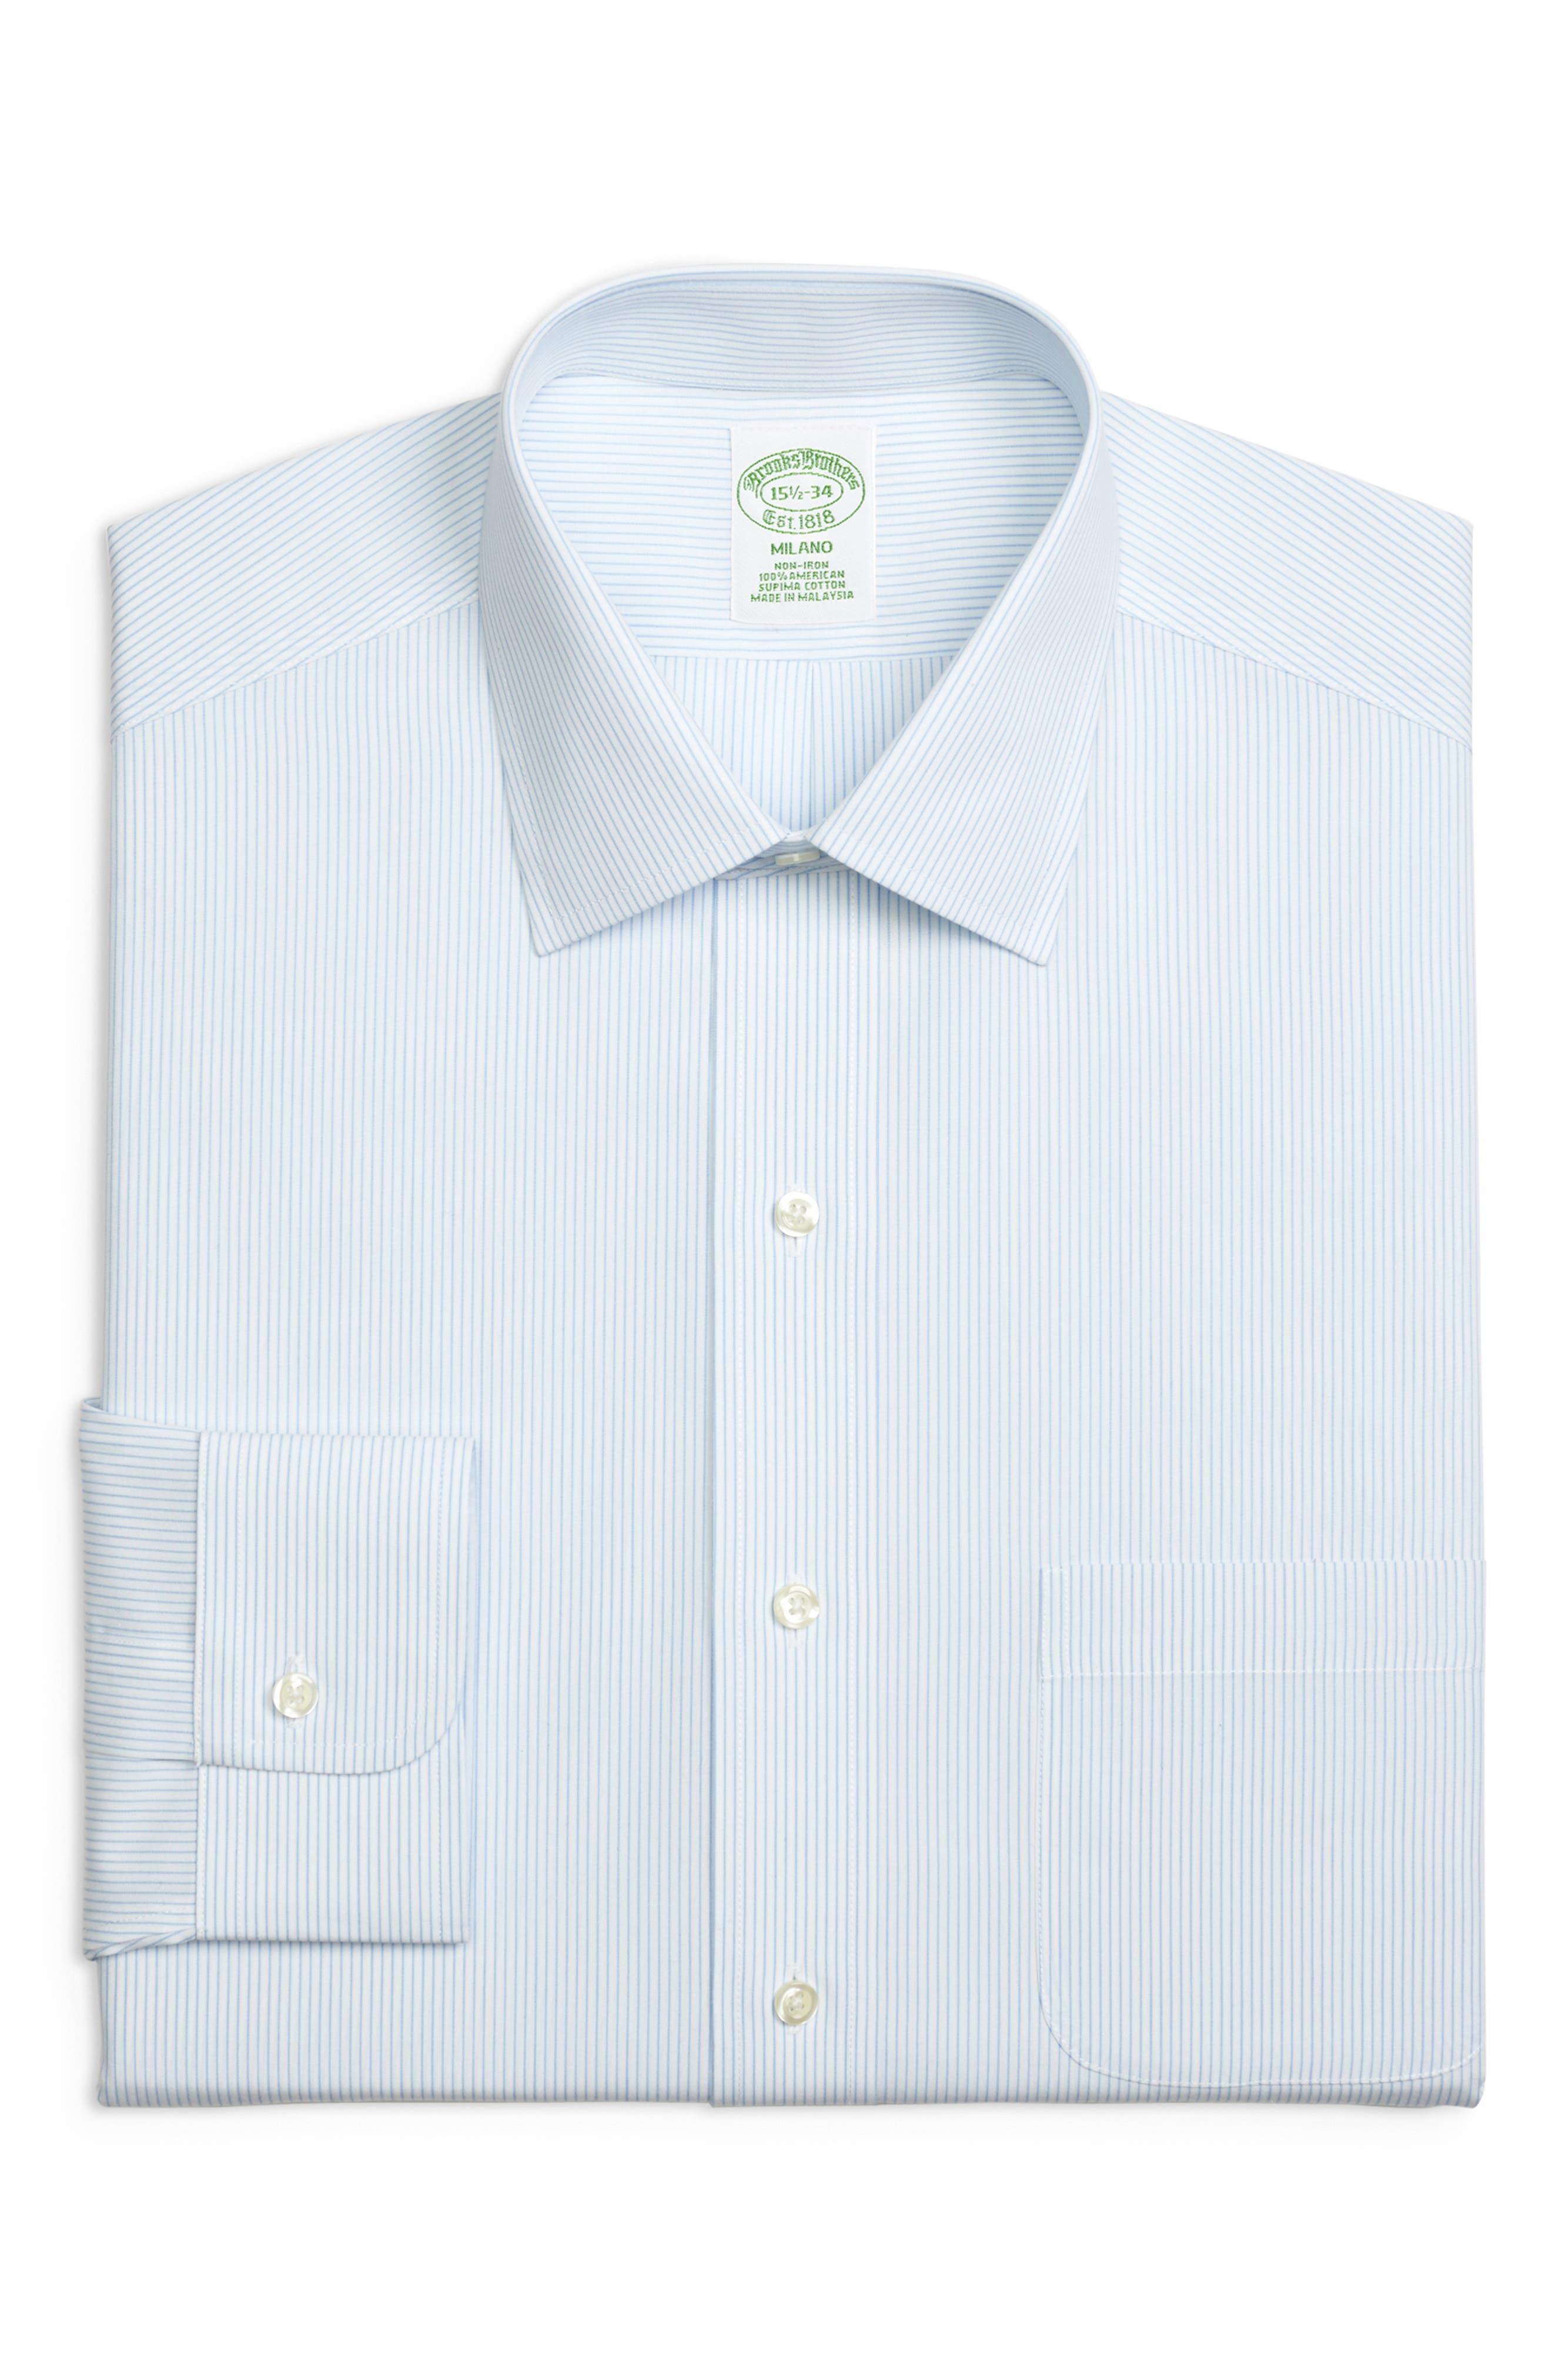 Trim Fit Stripe Dress Shirt,                             Main thumbnail 1, color,                             LIGHT/ PASTEL BLUE